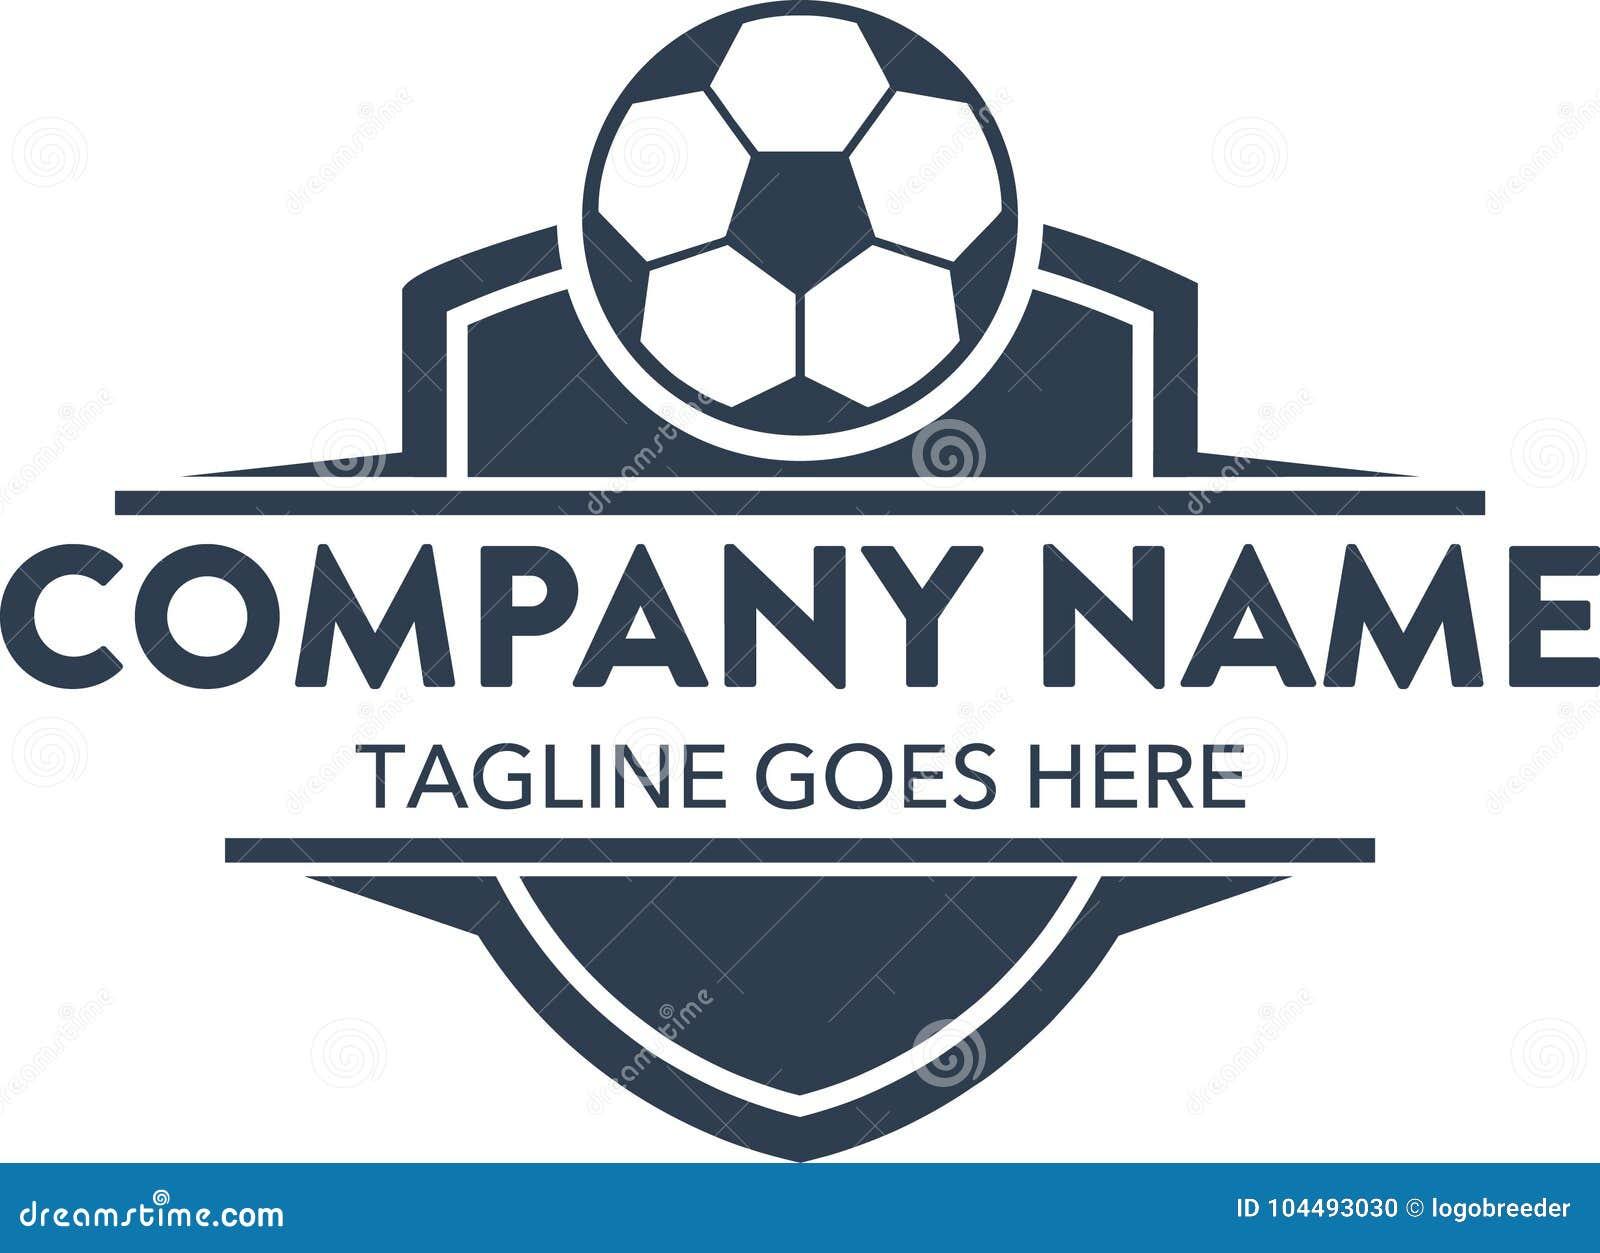 unique football soccer related logo template vector editable stock